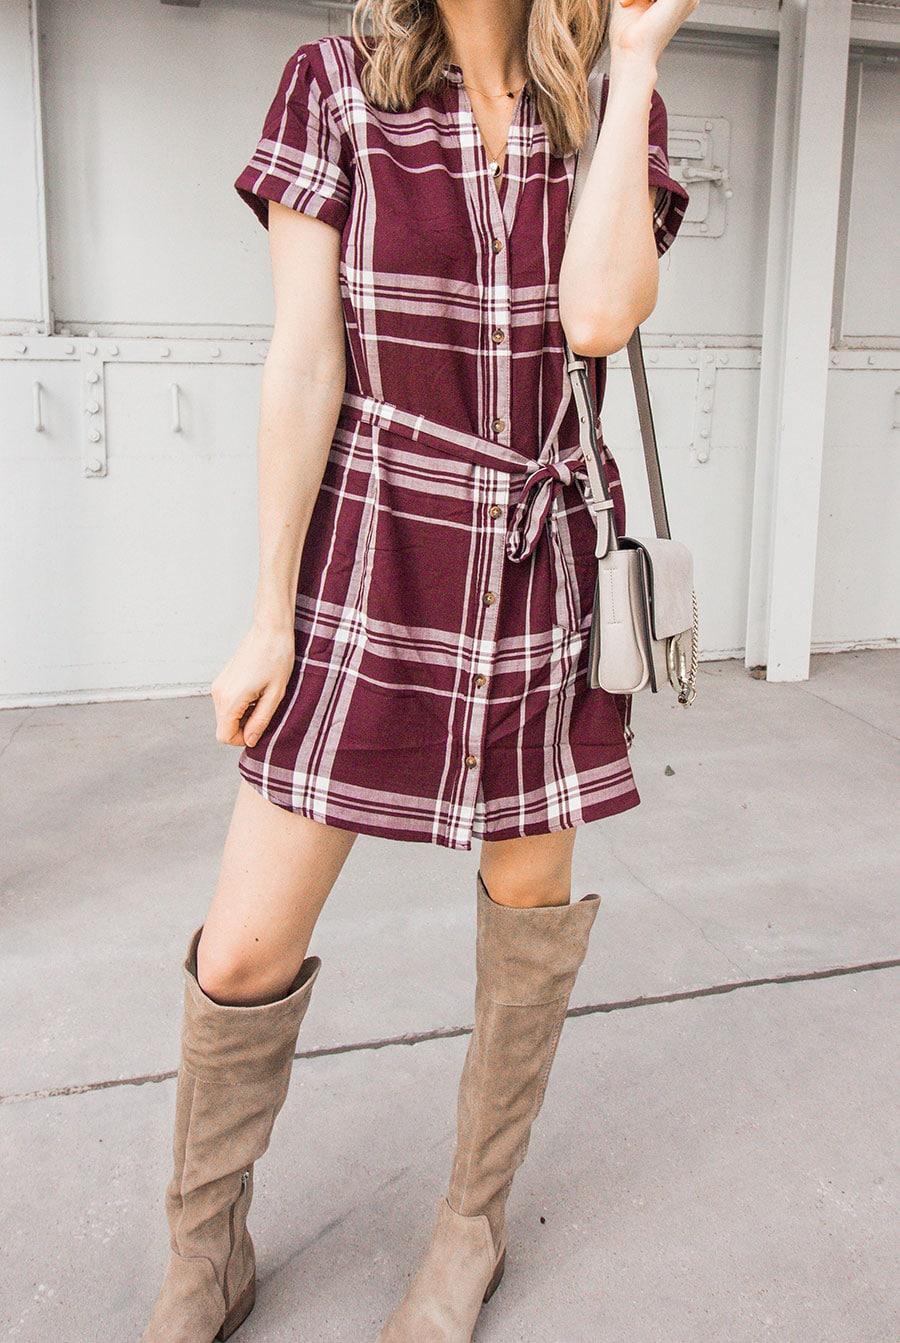 comfiest plaid dress